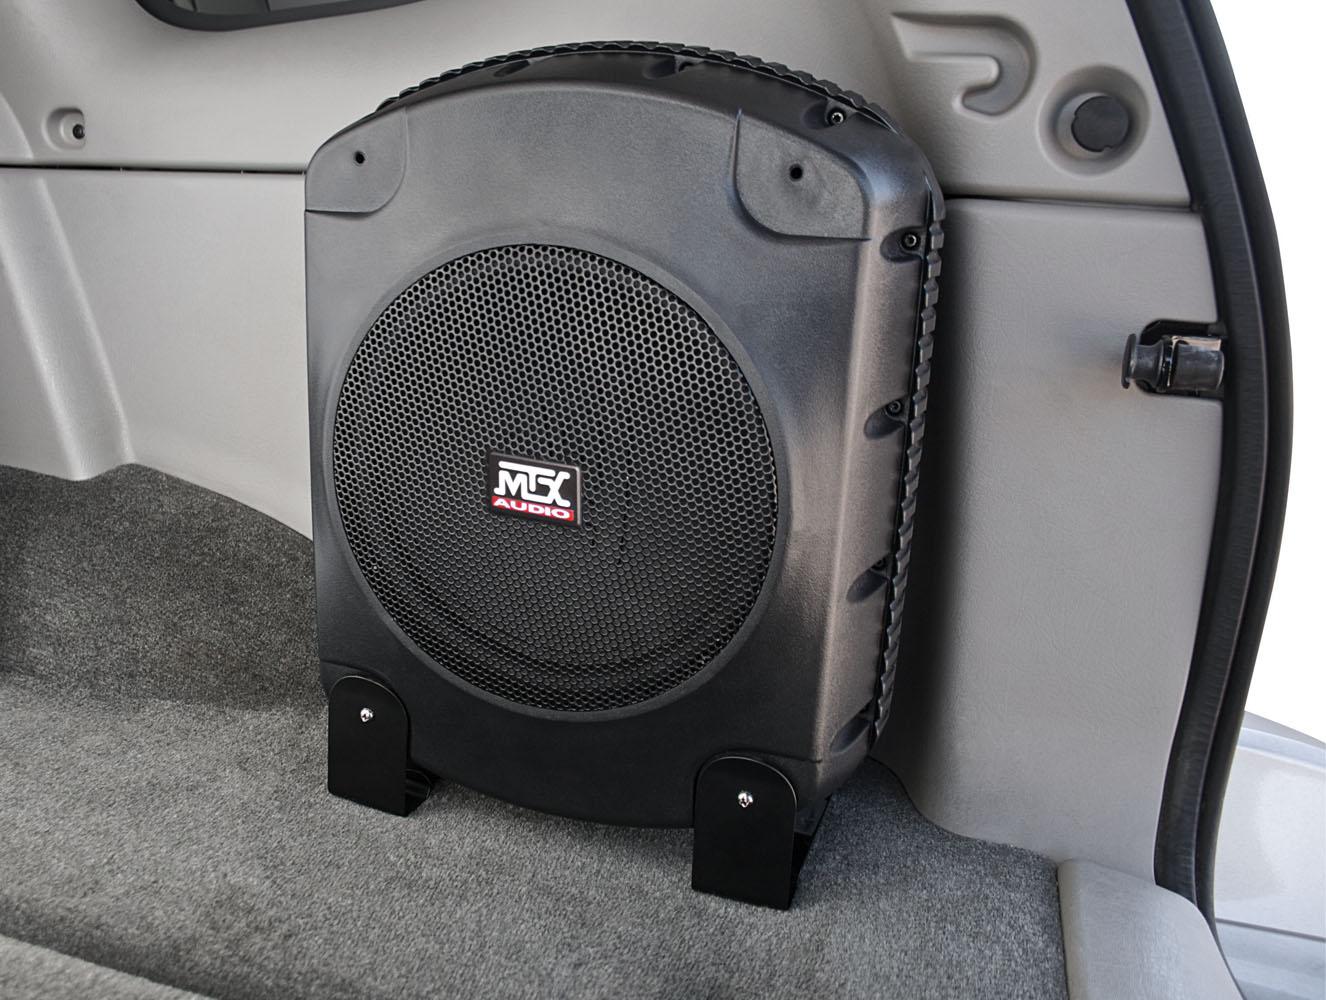 Xtl110p Powered Car Subwoofer Enclosure Mtx Audio